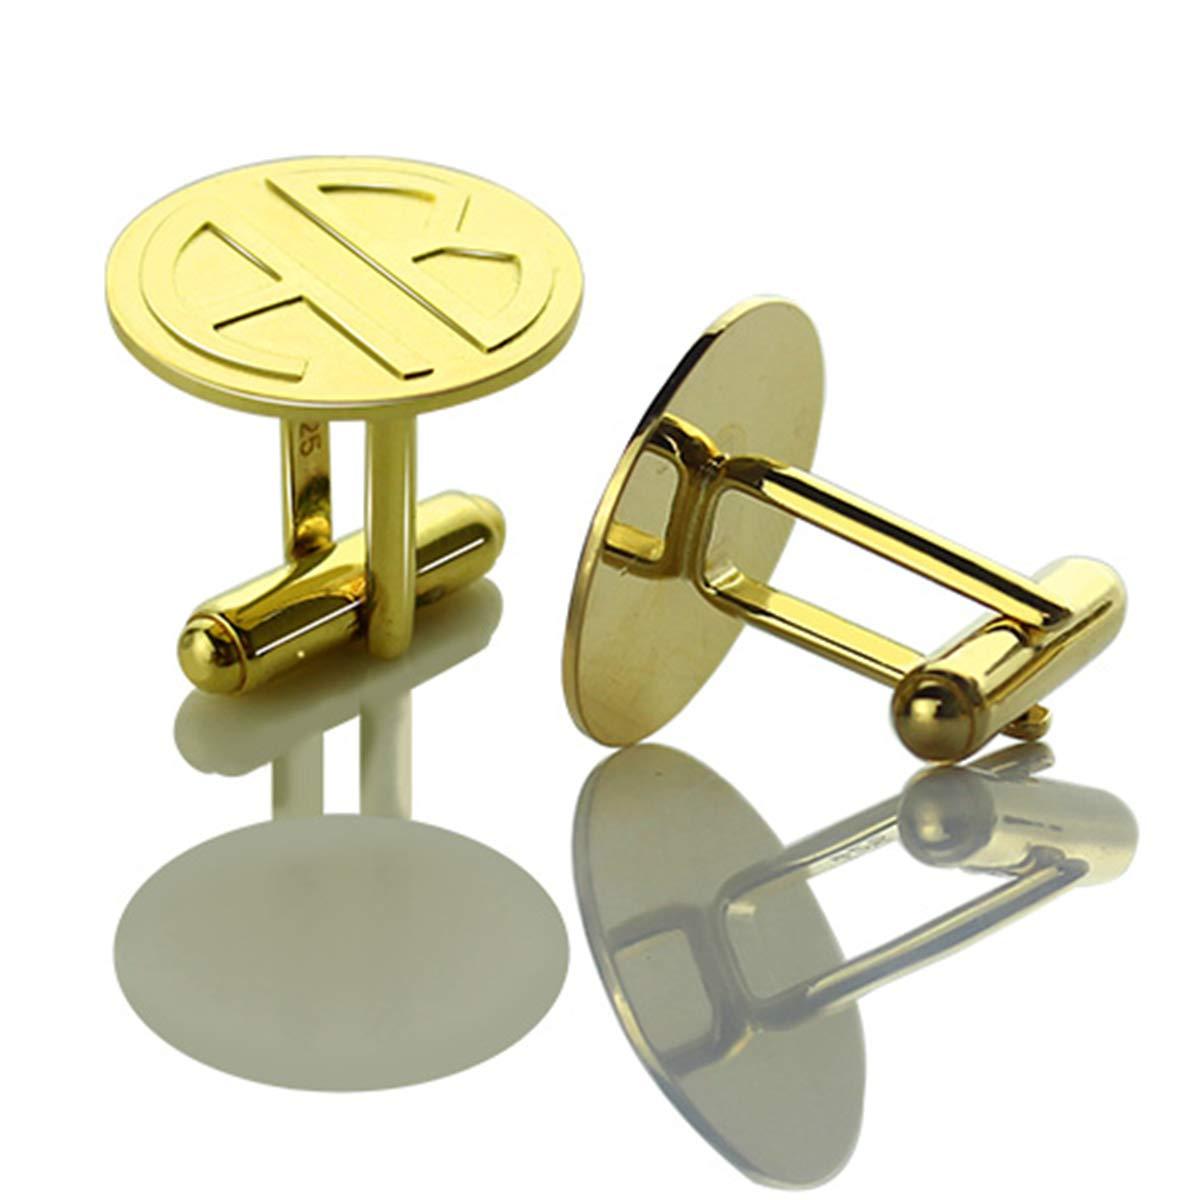 AILIN Personalized Disc Block Monogram Initials Cuff Links Custom Wedding Cufflinks Gift for Men Father Dad Husband Boy Gold